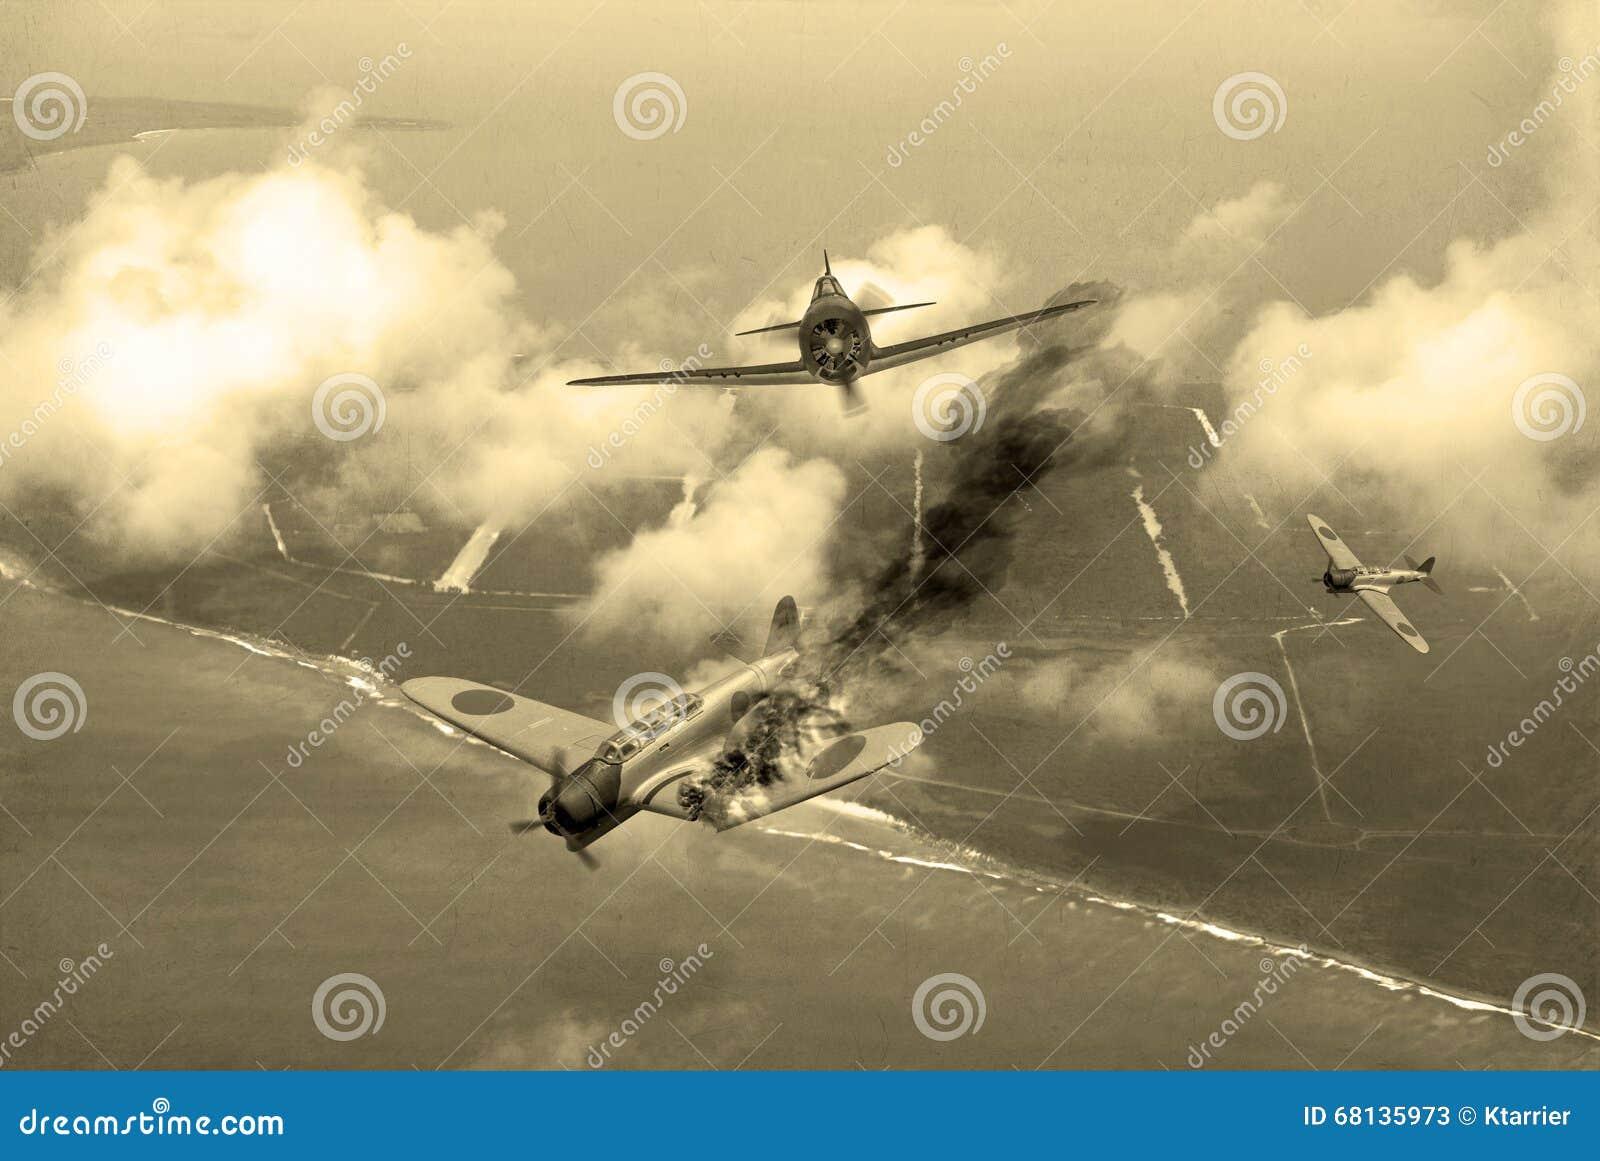 World War 2 dogfight stock illustration  Illustration of tokyo